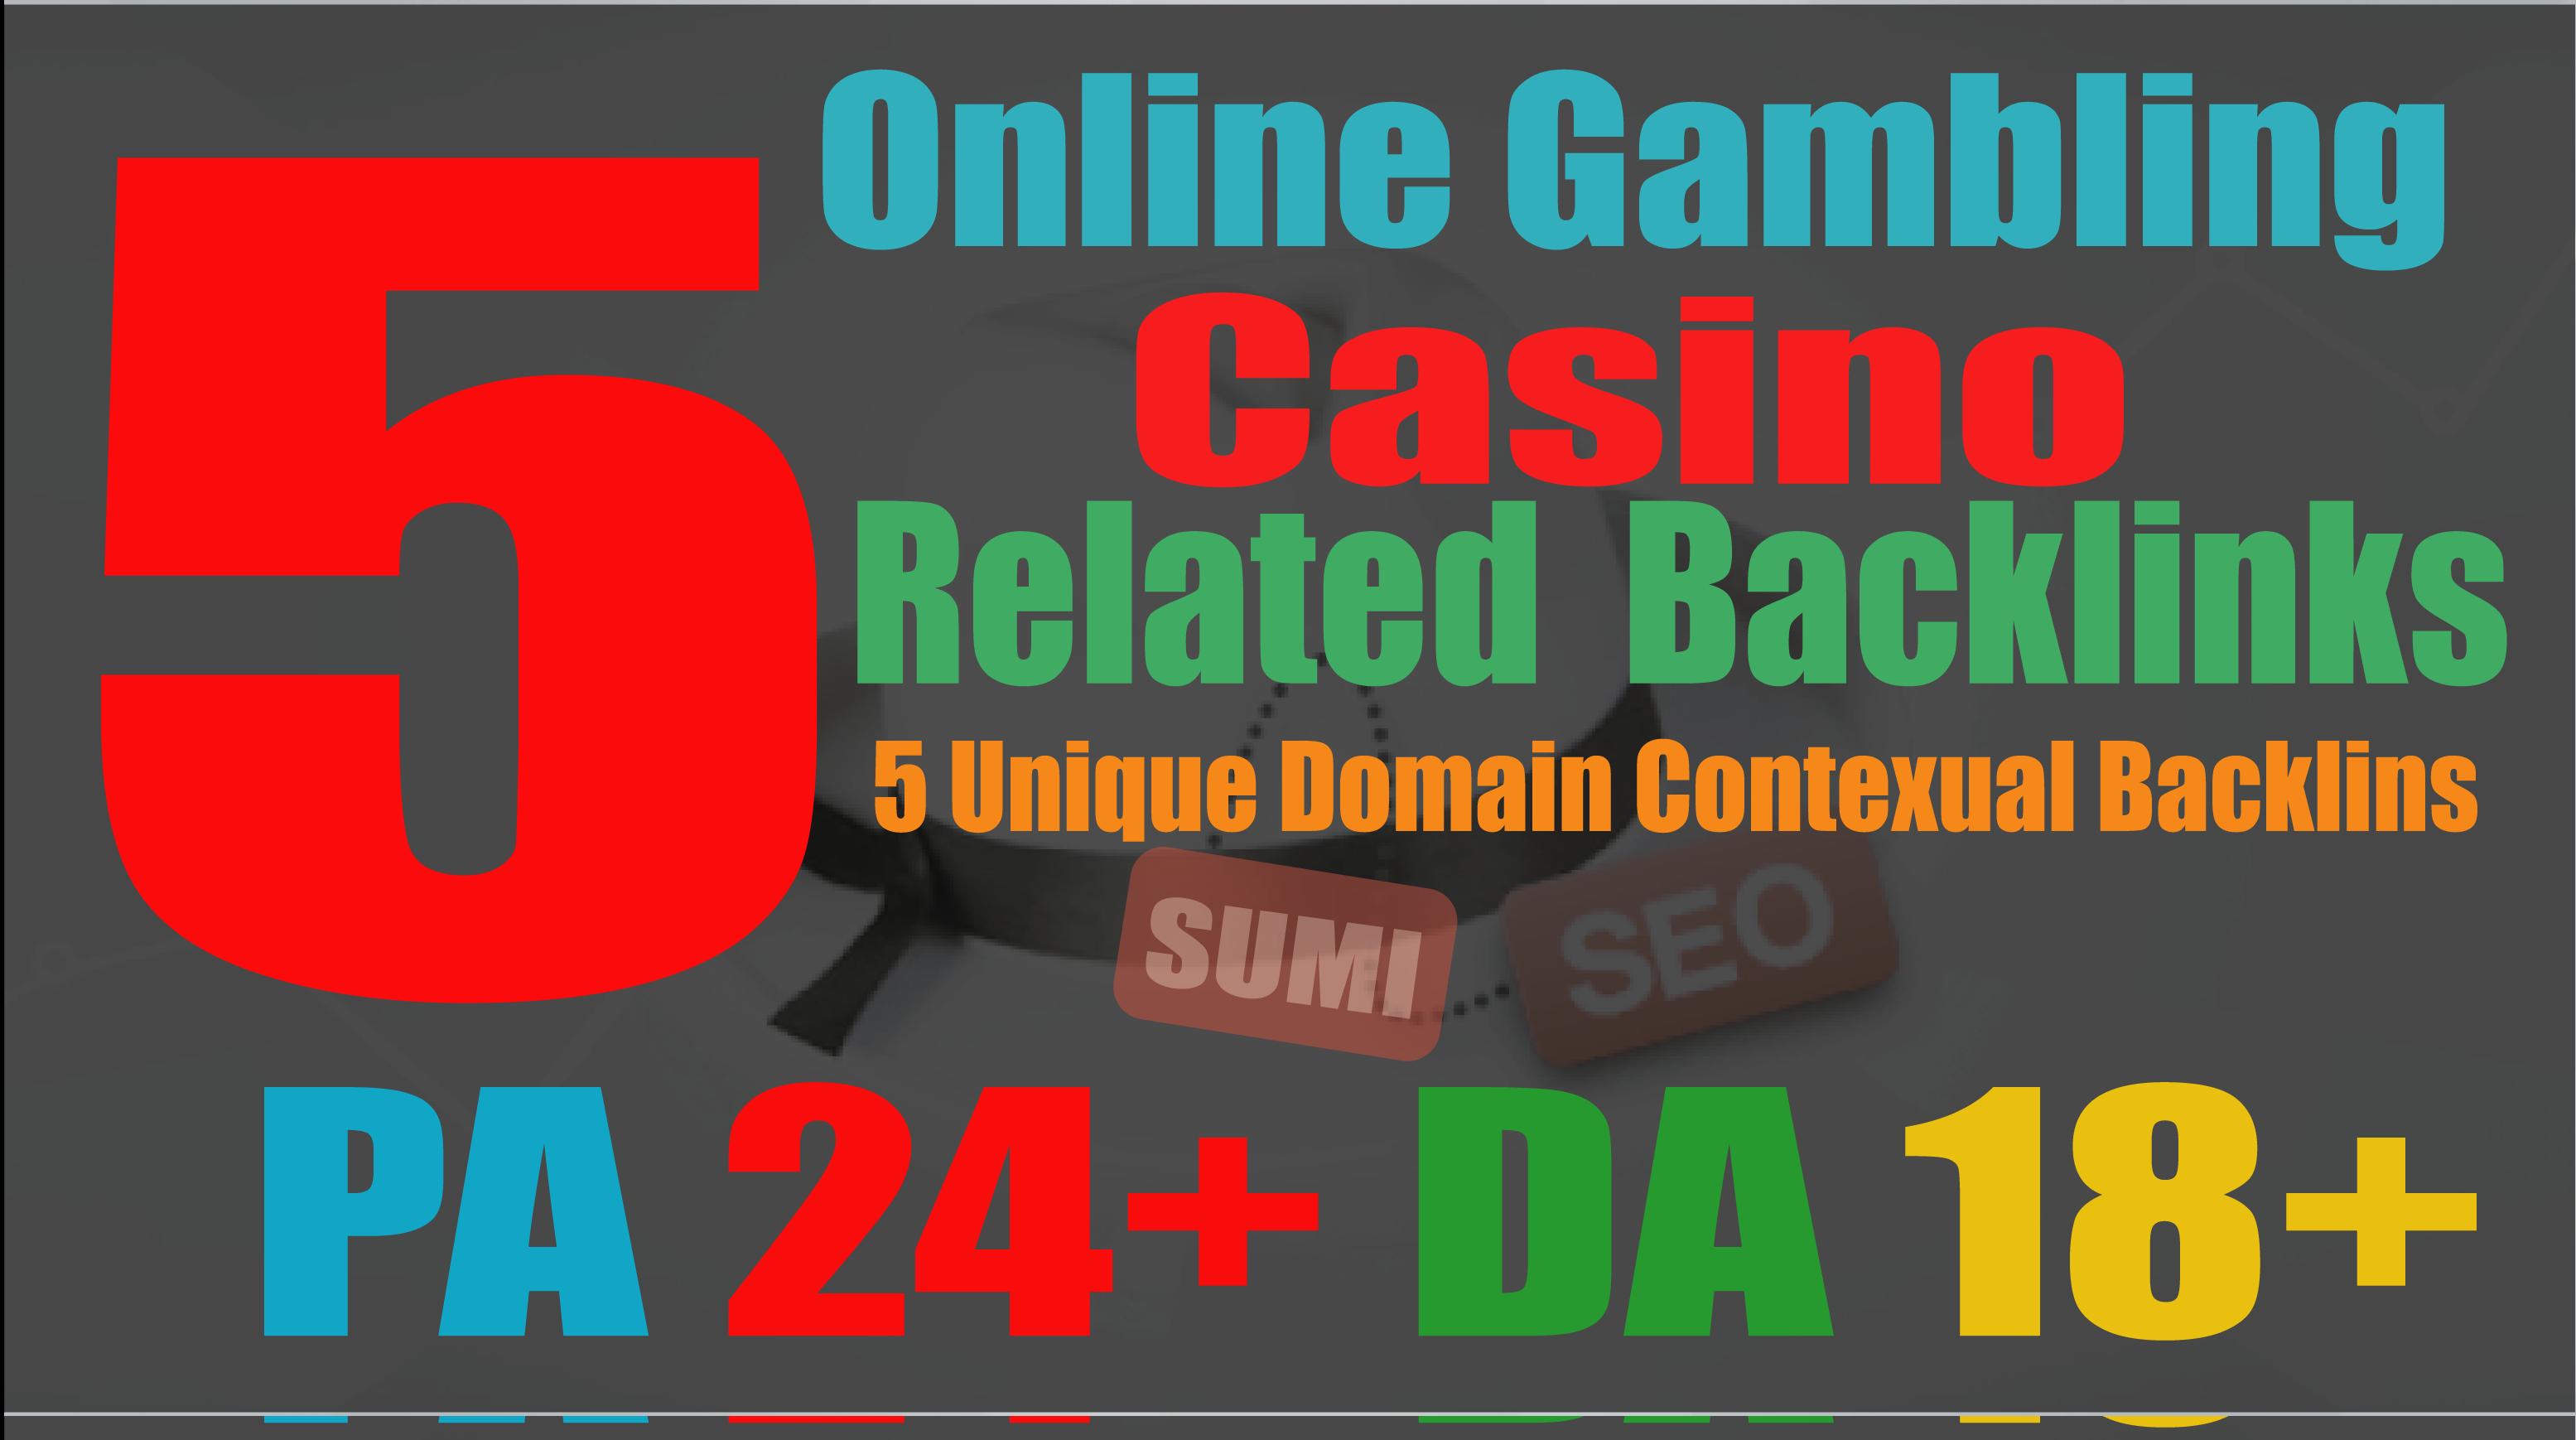 manually do 5 Casino PBN Backlinks from Gambling, Casino sites